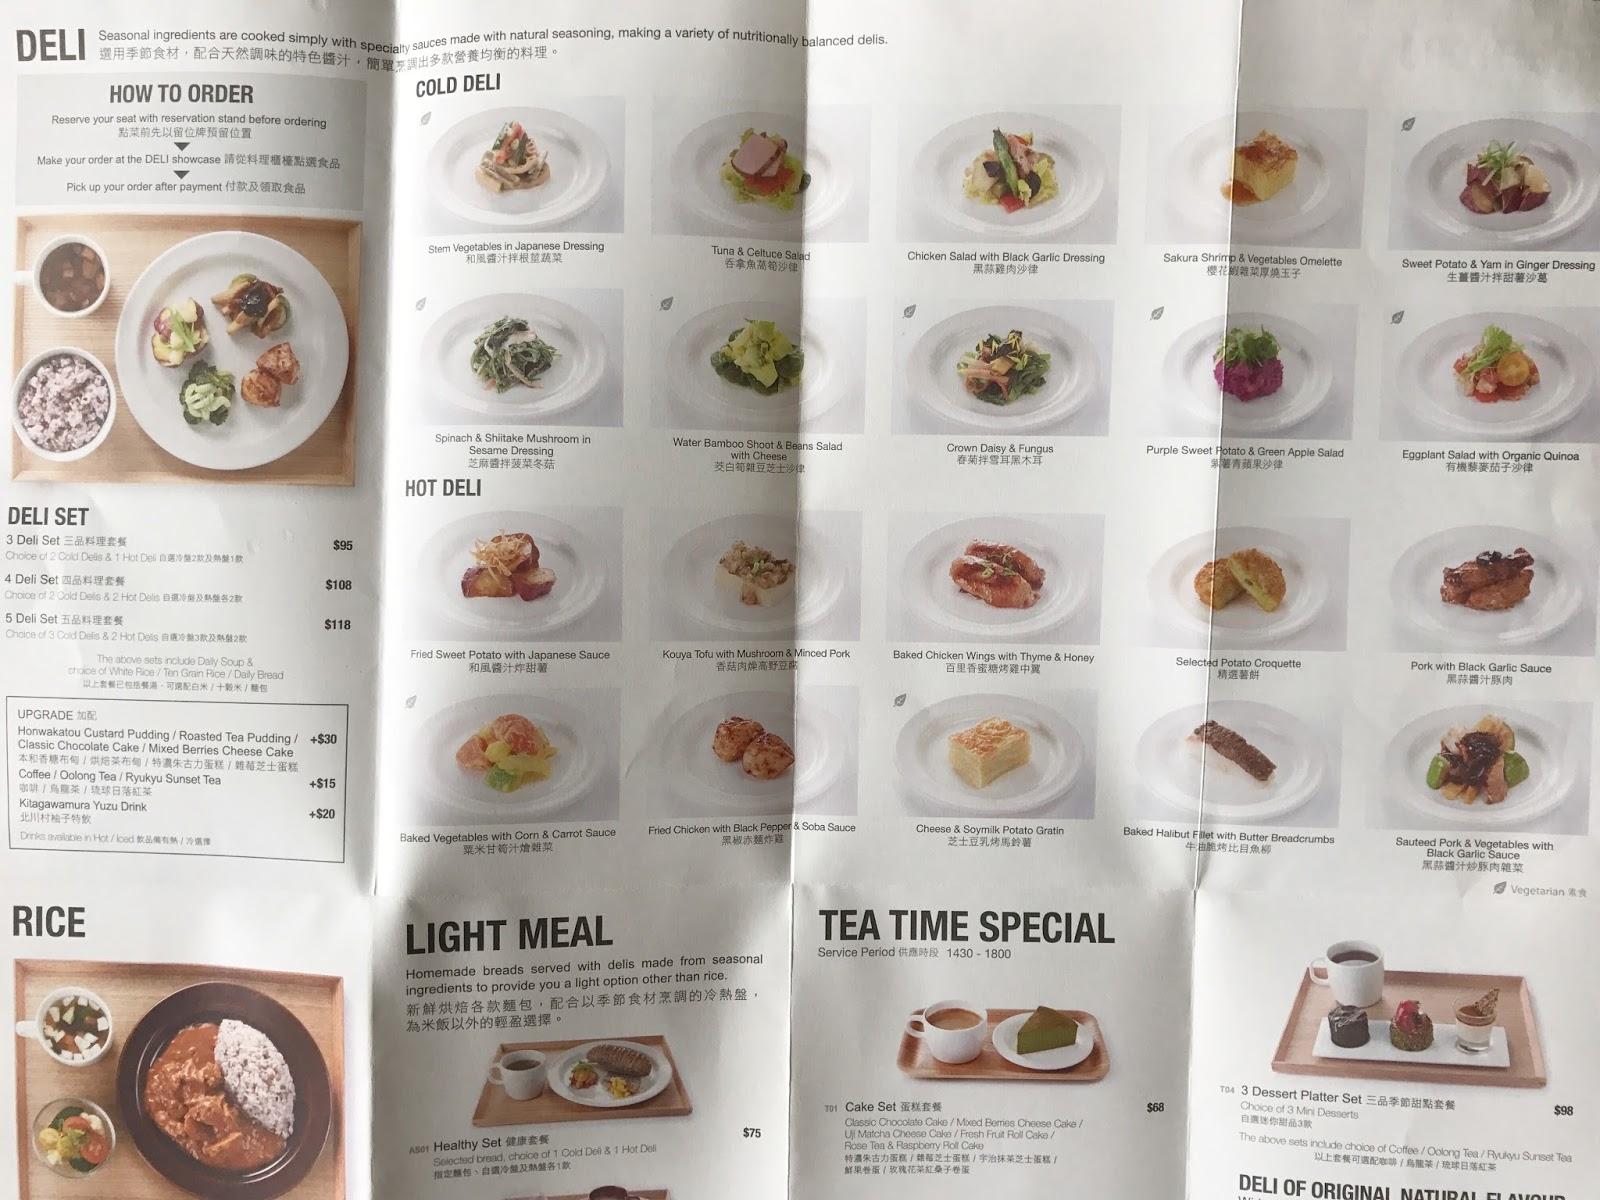 muji-cafe-hk-menu-2017